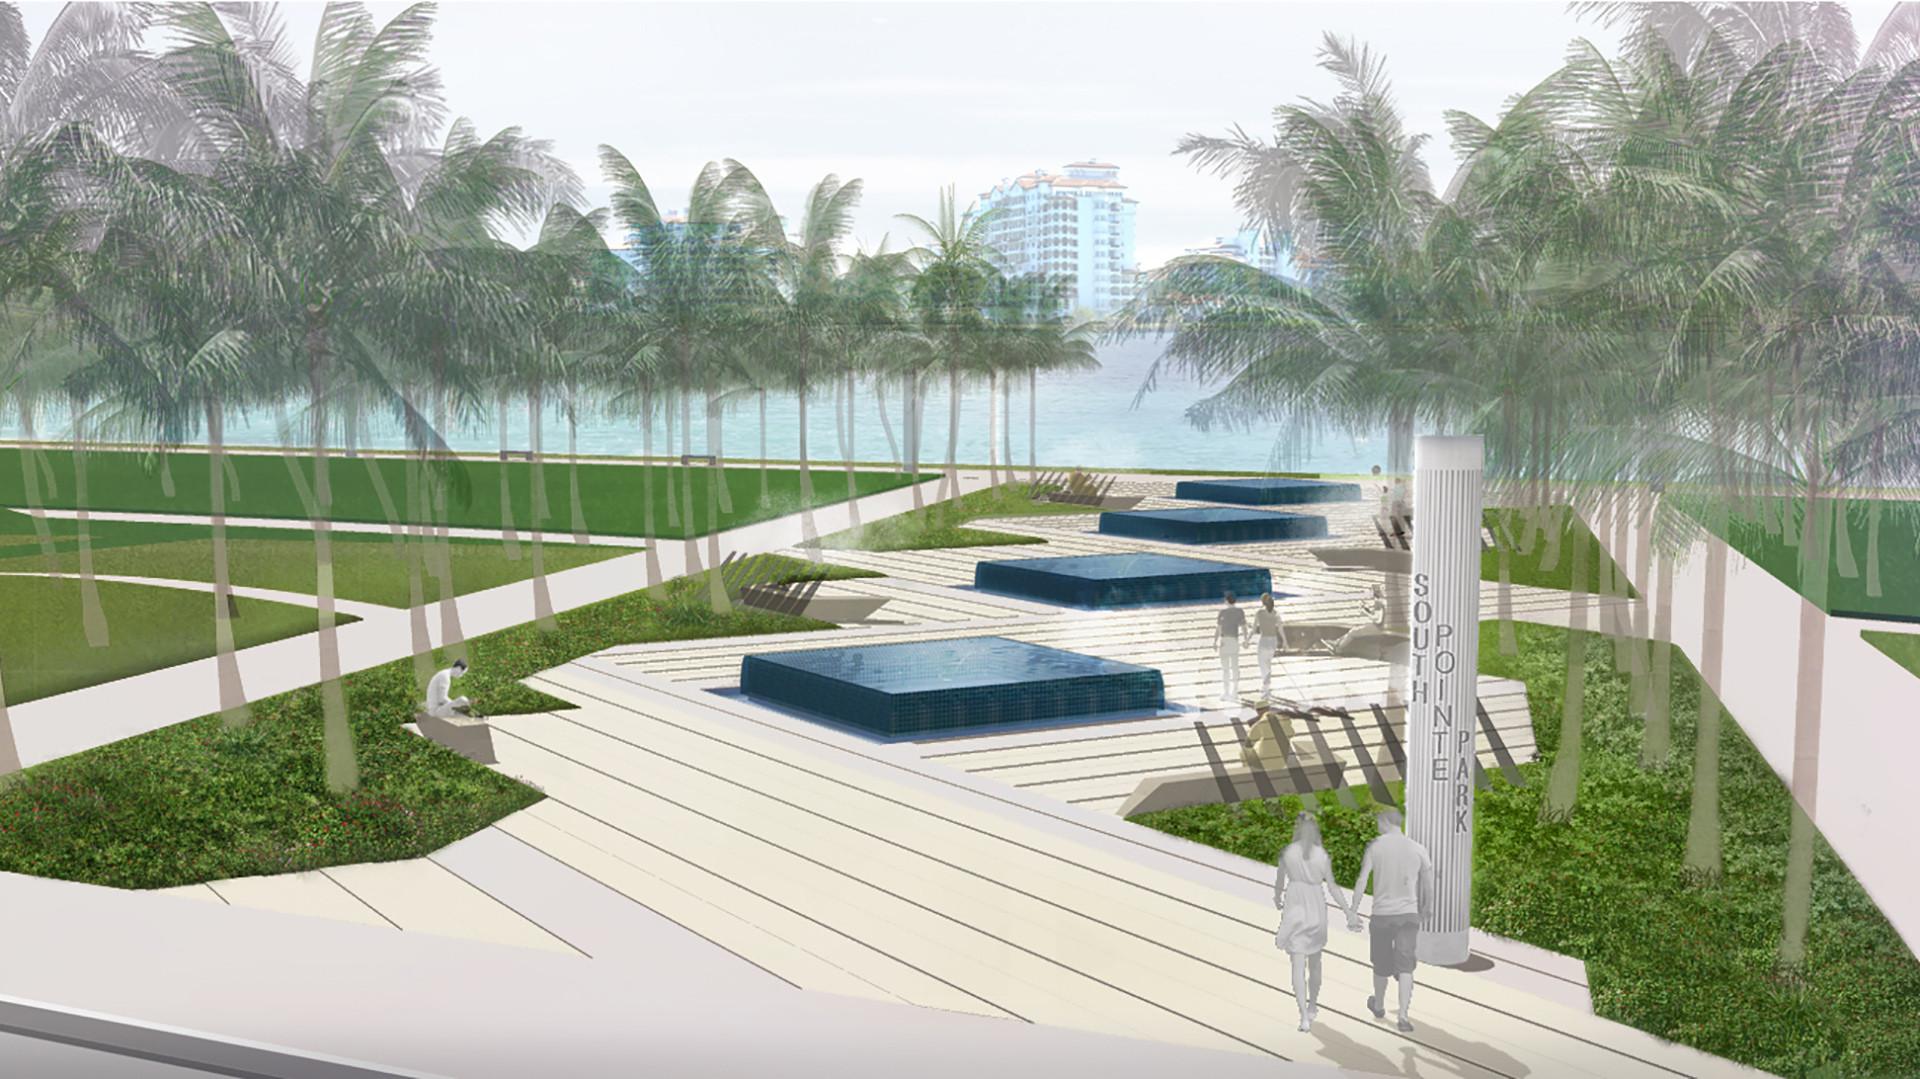 Landscape Fountain Public  South Pointe Park Fountain Plaza Remediation Edsa